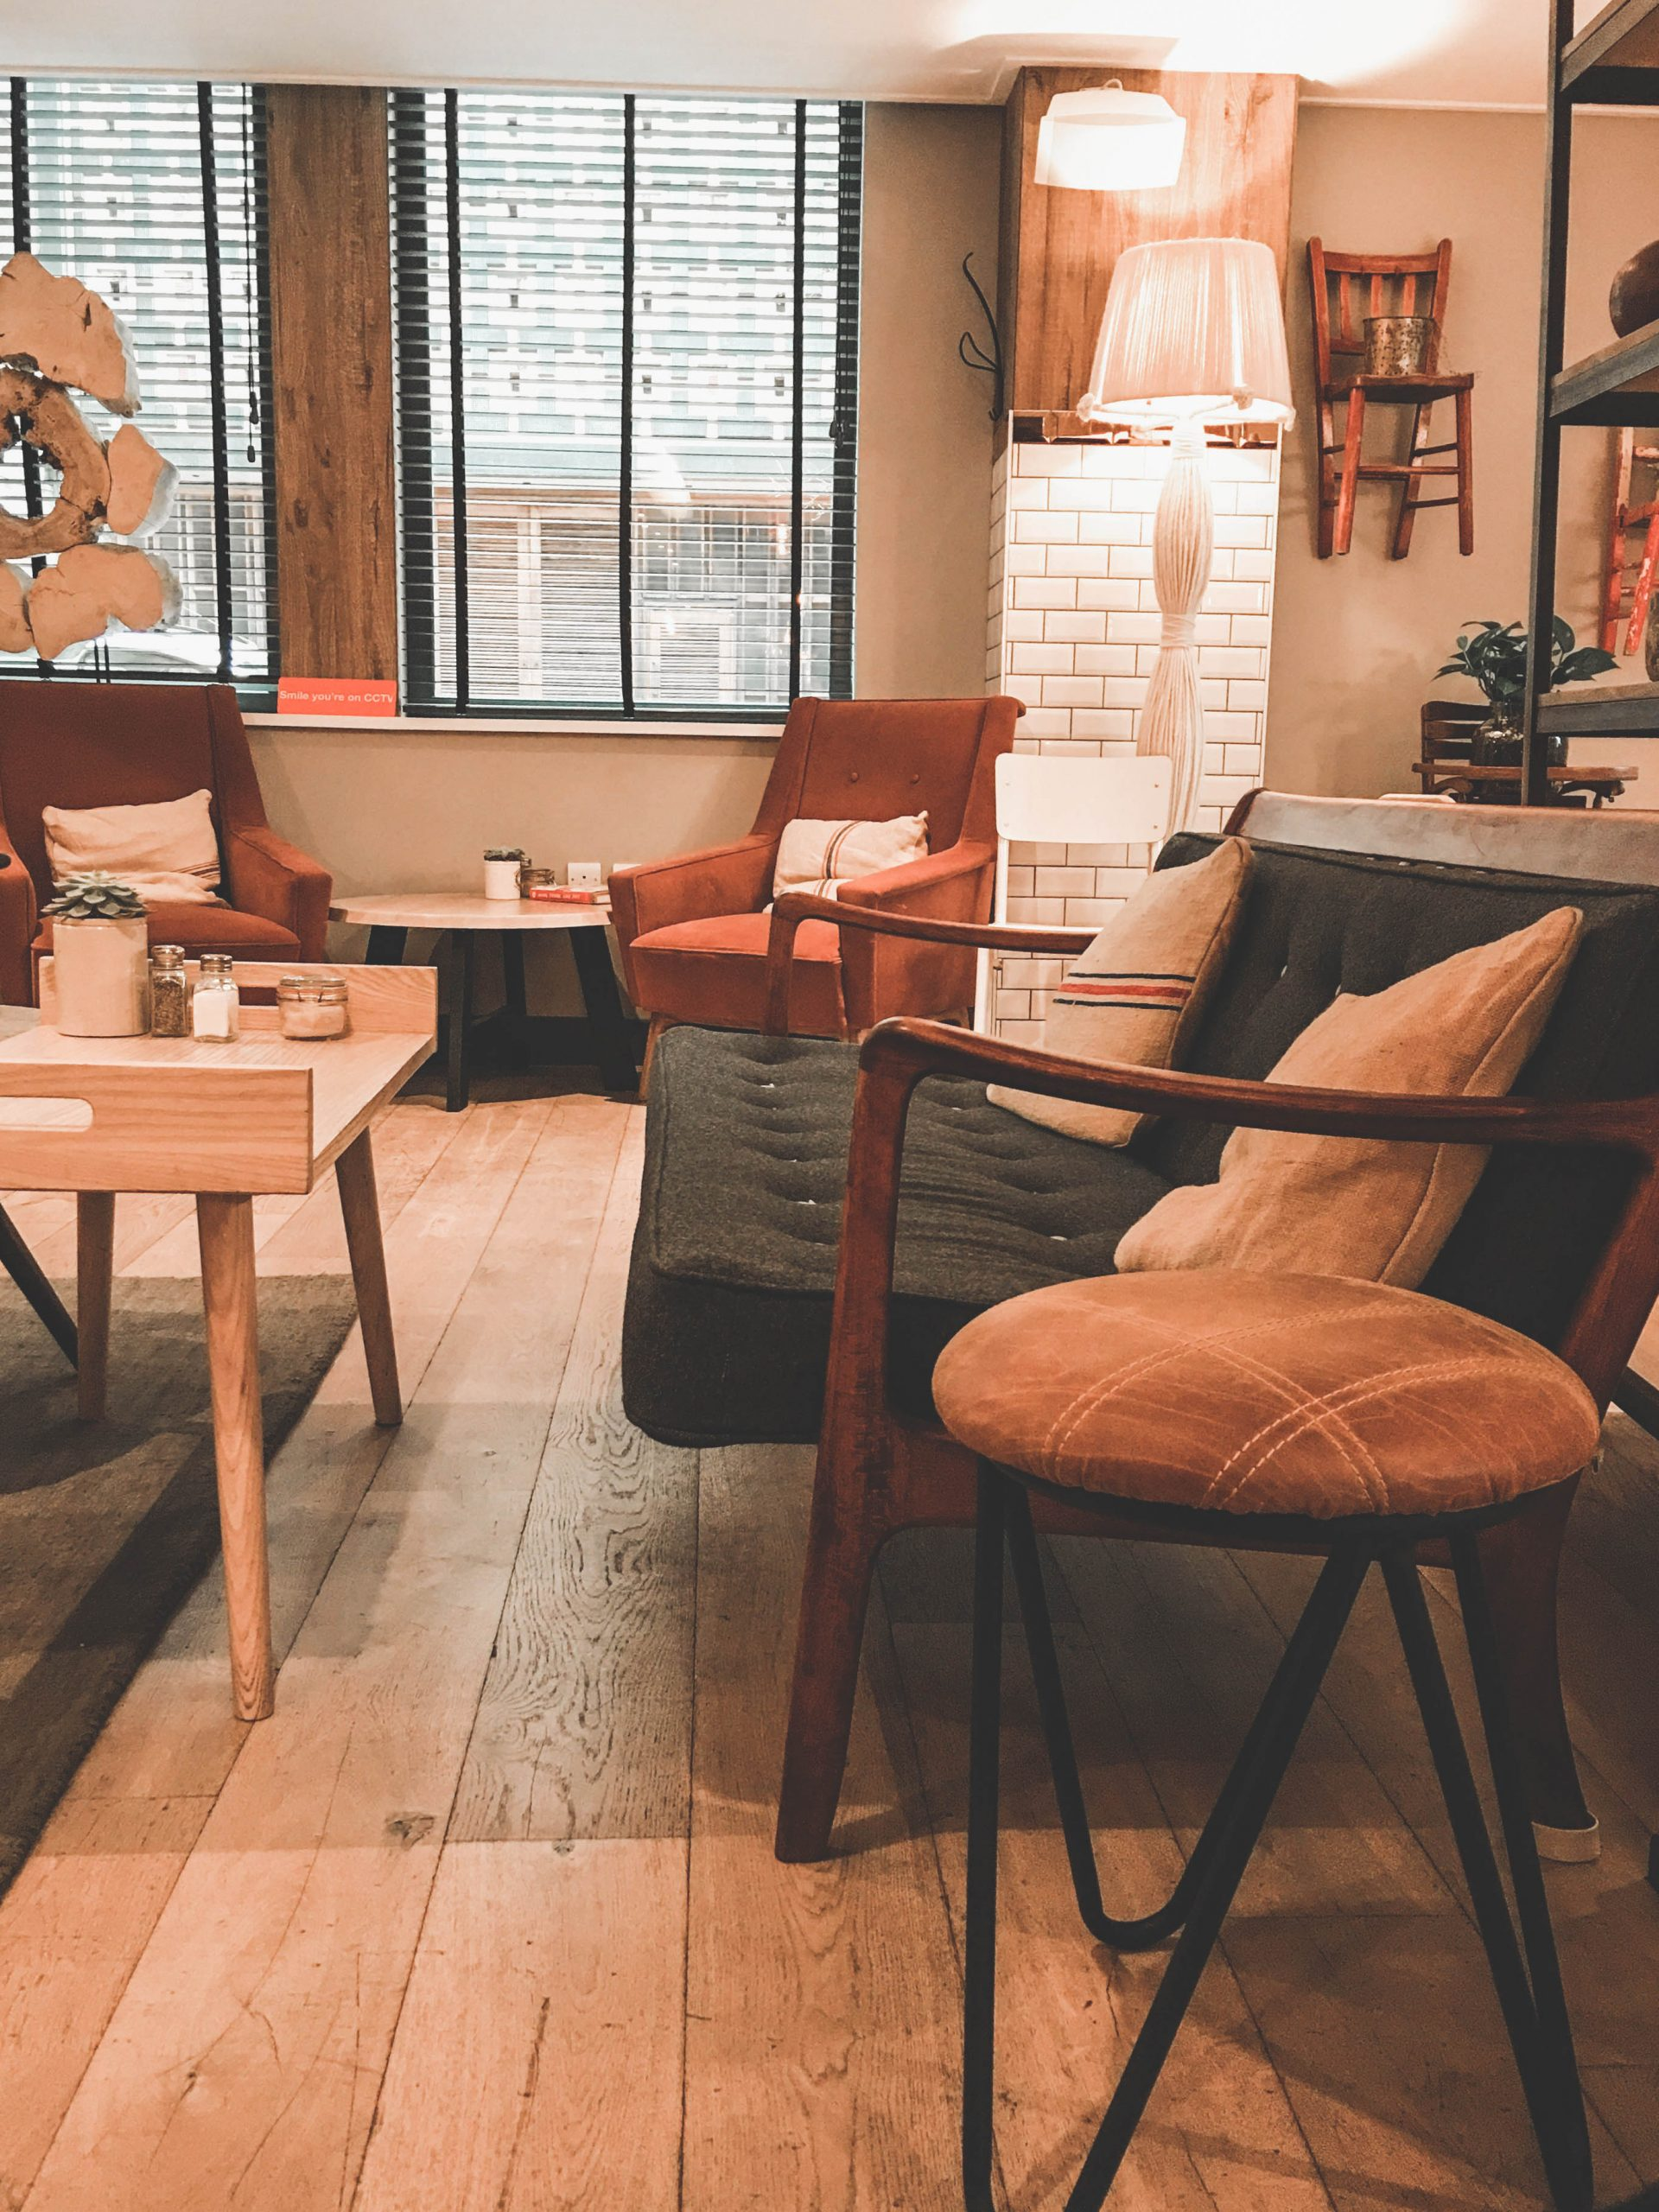 Hotel Qbic à Londres